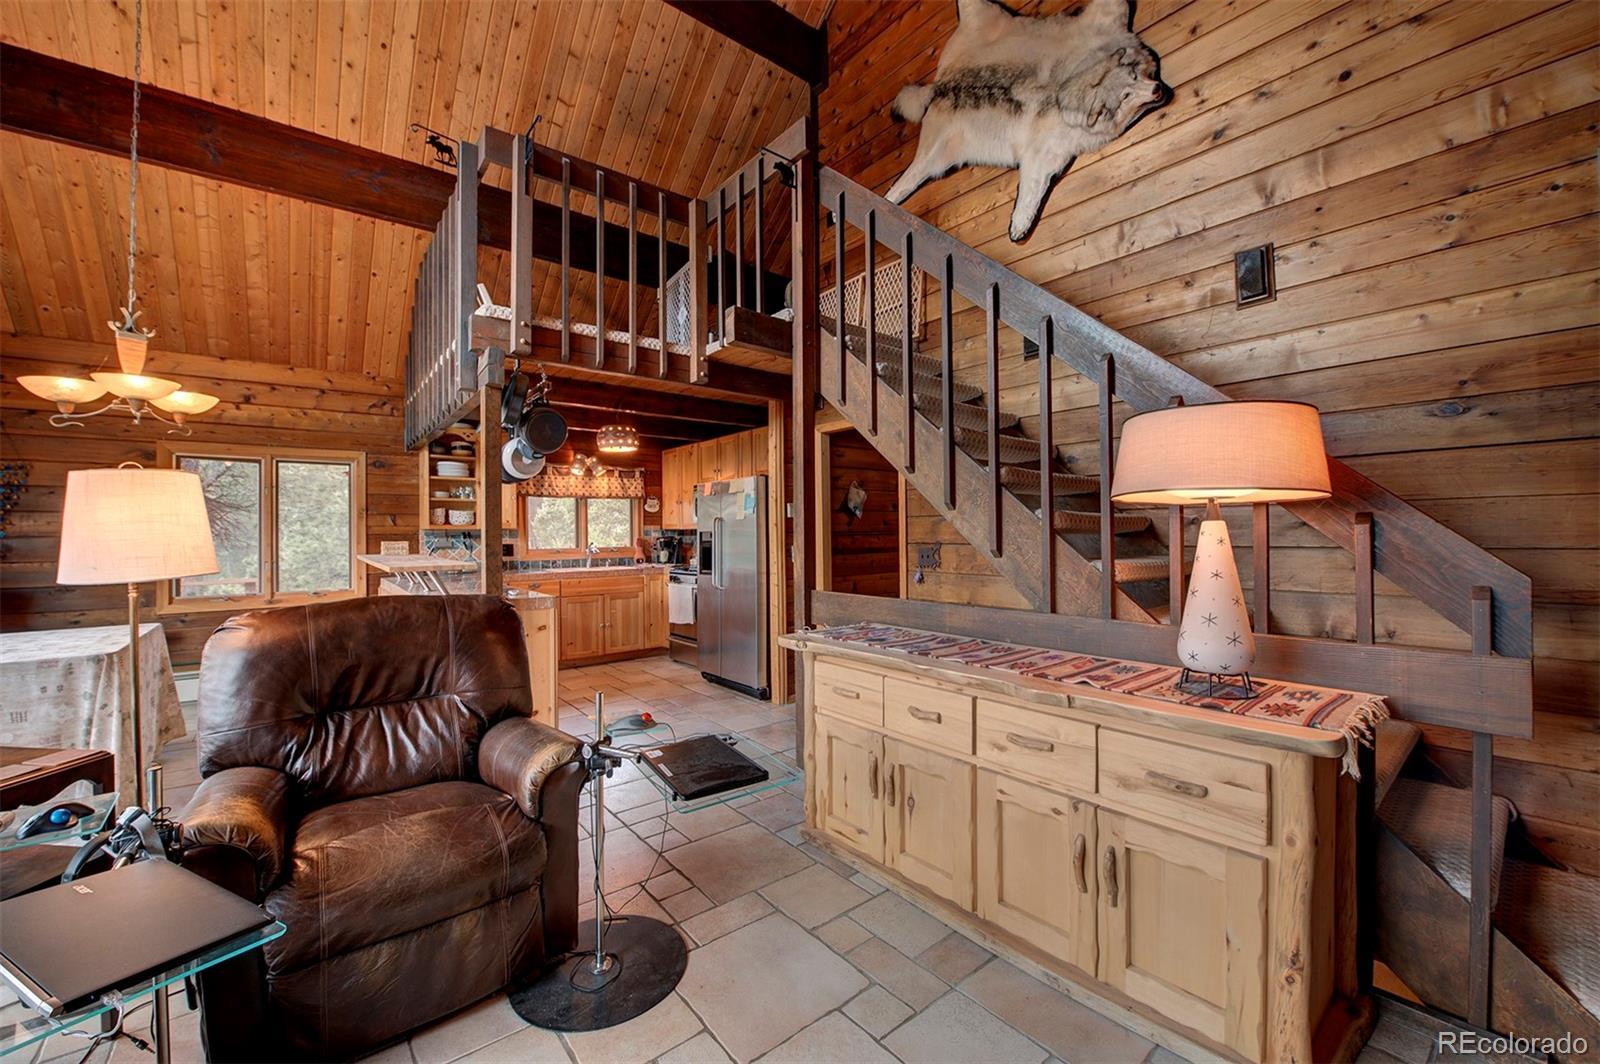 MLS# 6922377 - 6 - 12123 Geronimo Trail, Conifer, CO 80433